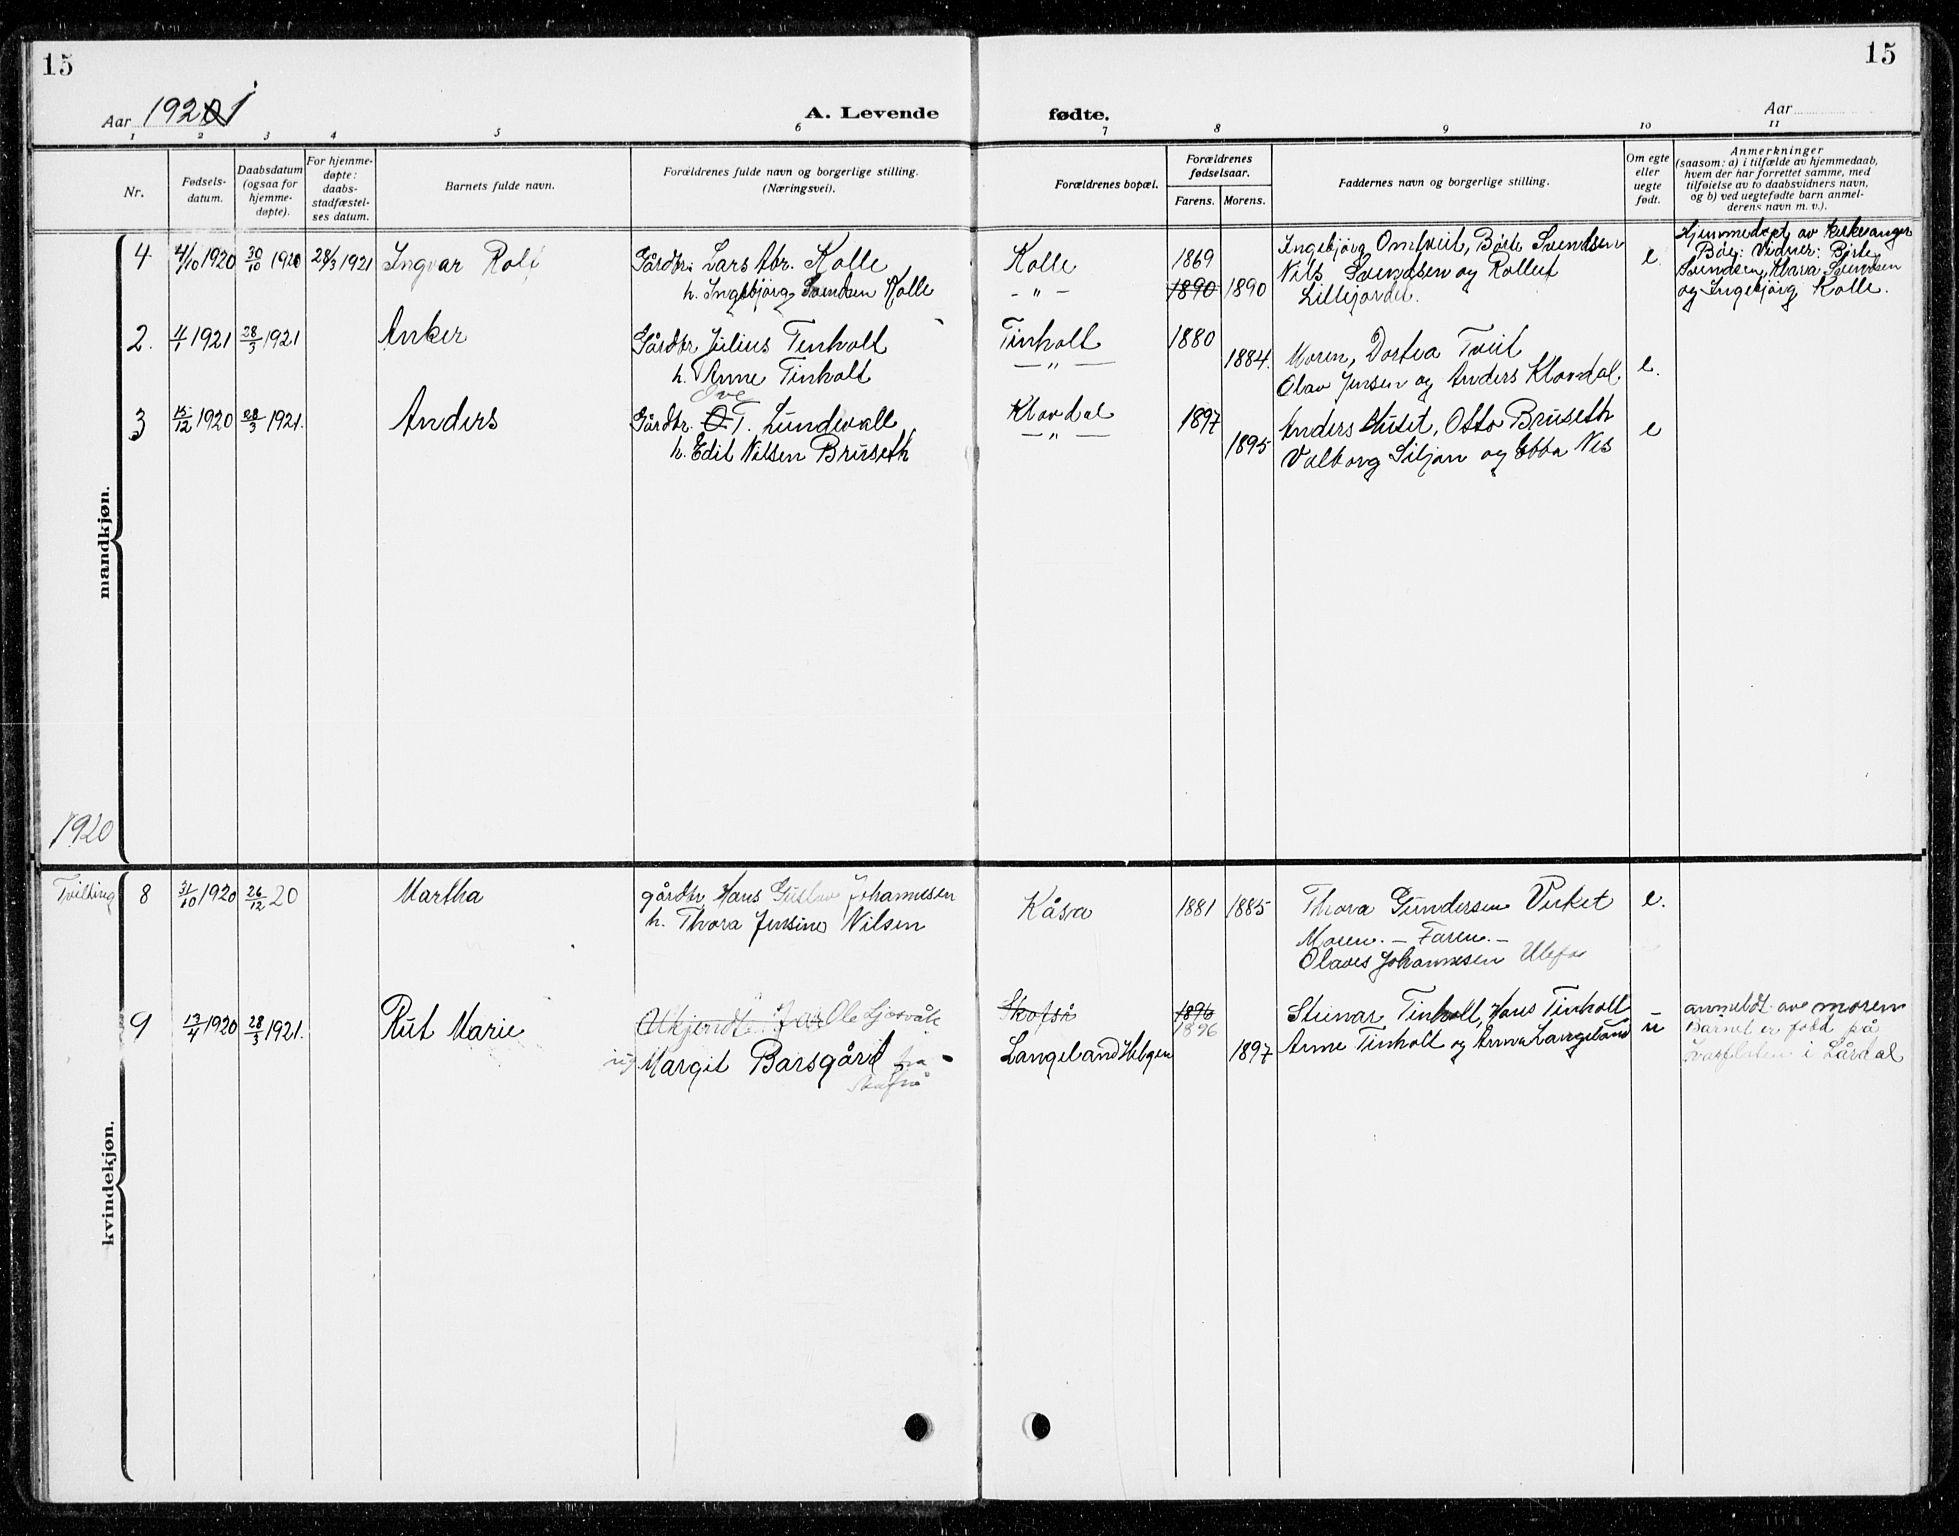 SAKO, Holla kirkebøker, G/Gb/L0003: Klokkerbok nr. II 3, 1914-1941, s. 15